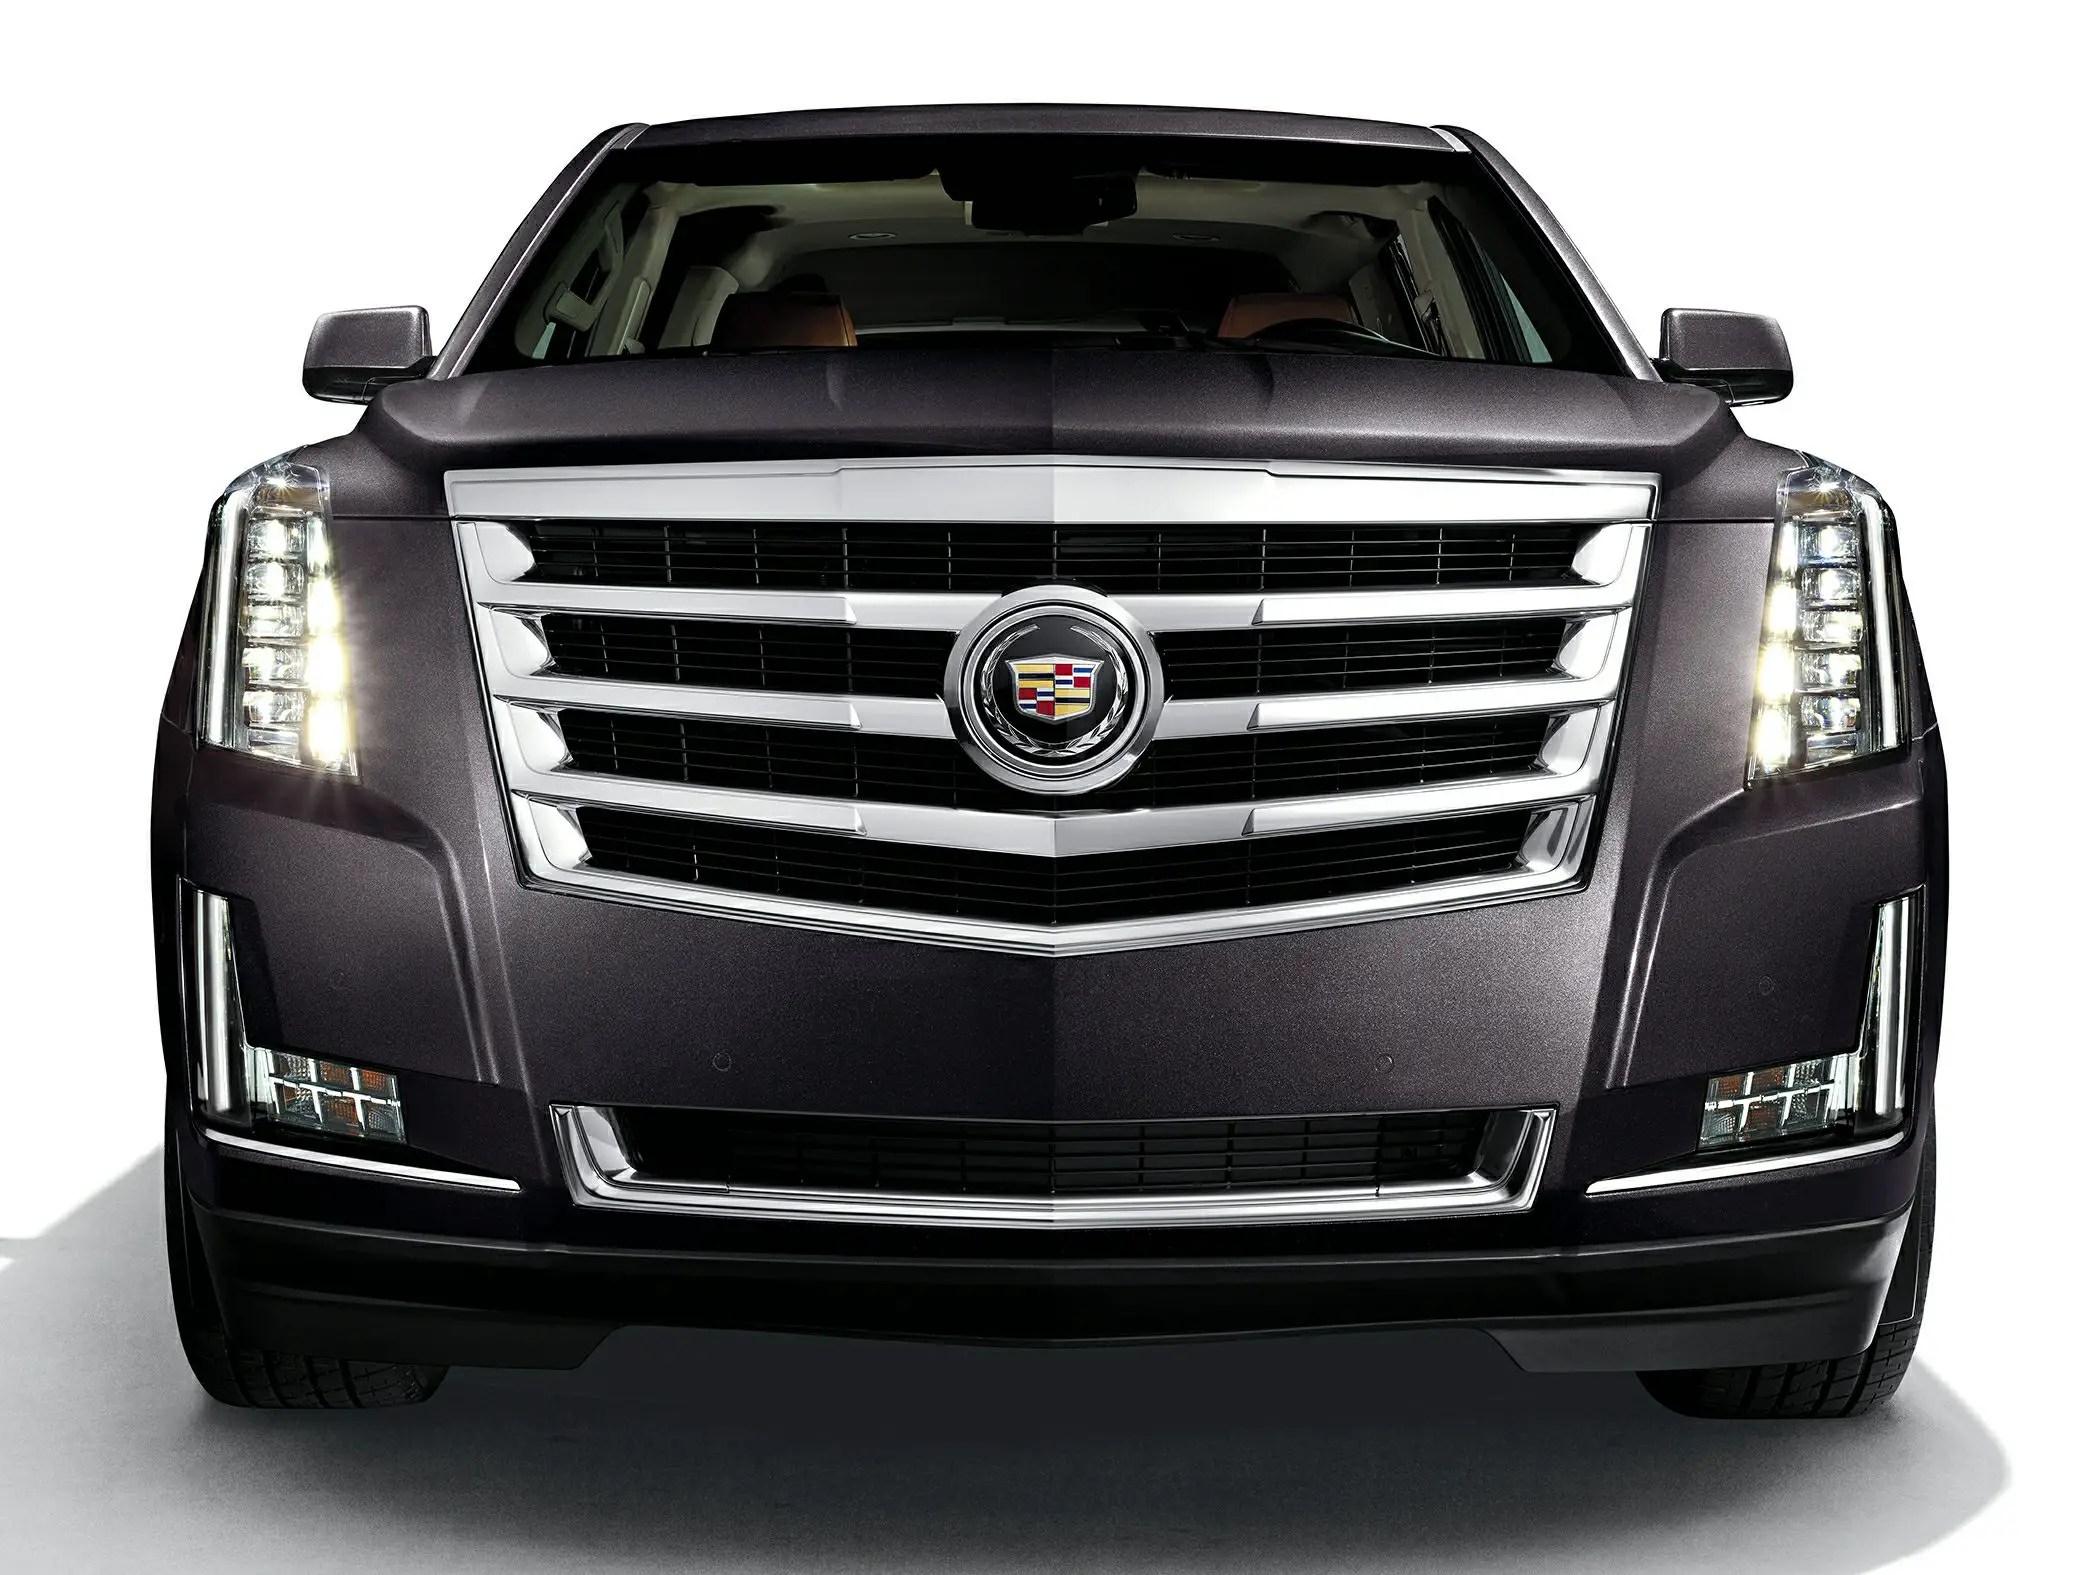 Cadillac Escalade Headlight Bulb Size